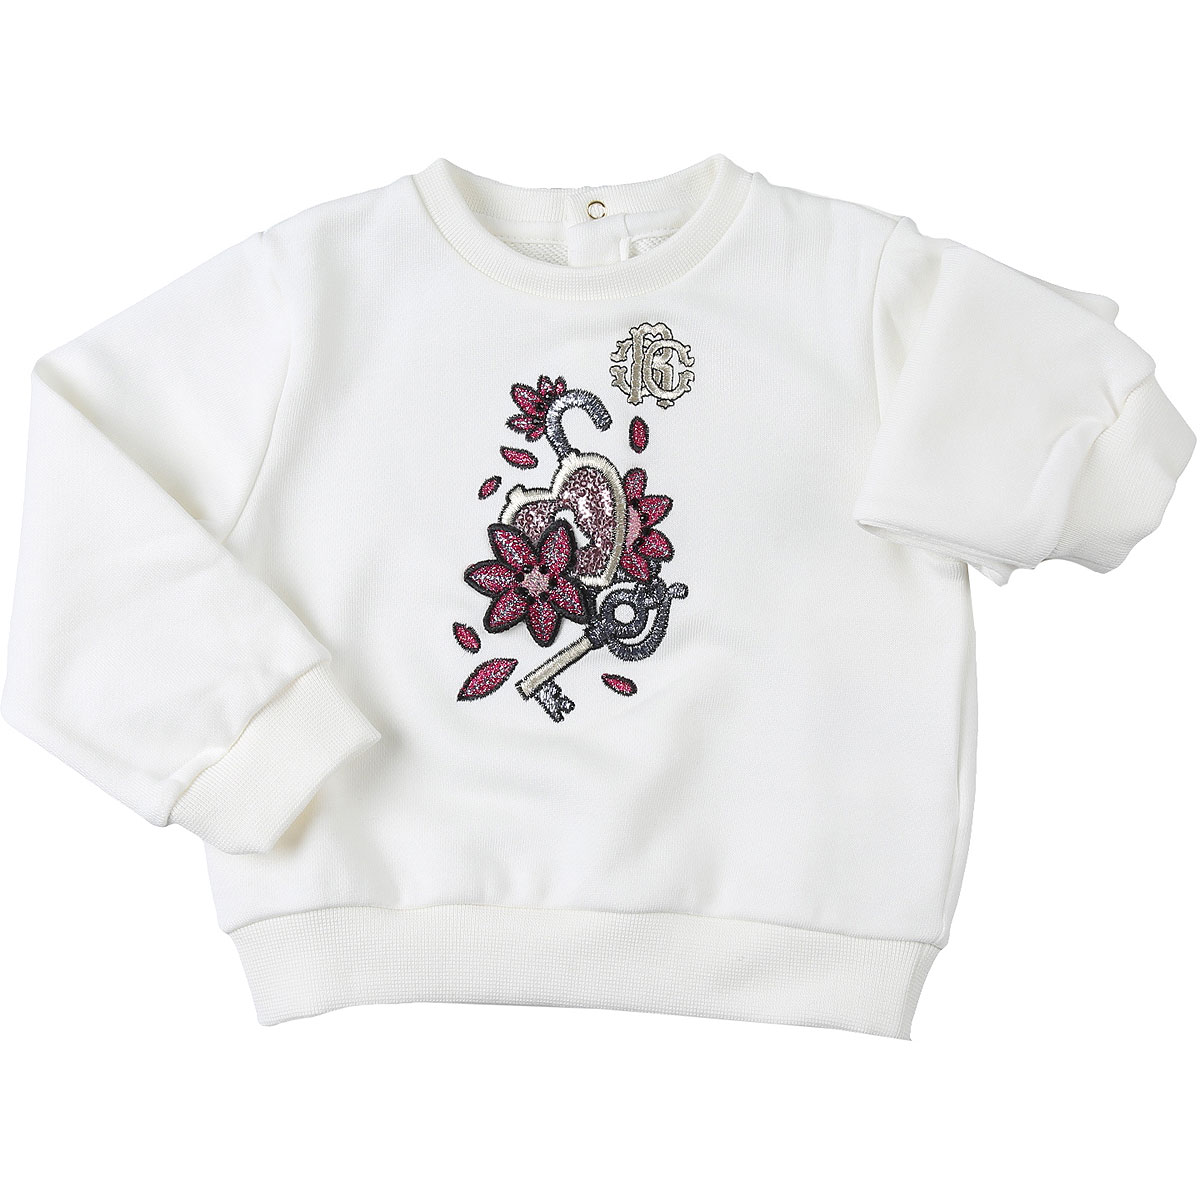 Roberto Cavalli Baby Sweatshirts & Hoodies for Girls On Sale, Cream, Cotton, 2019, 12M 18M 2Y 3Y